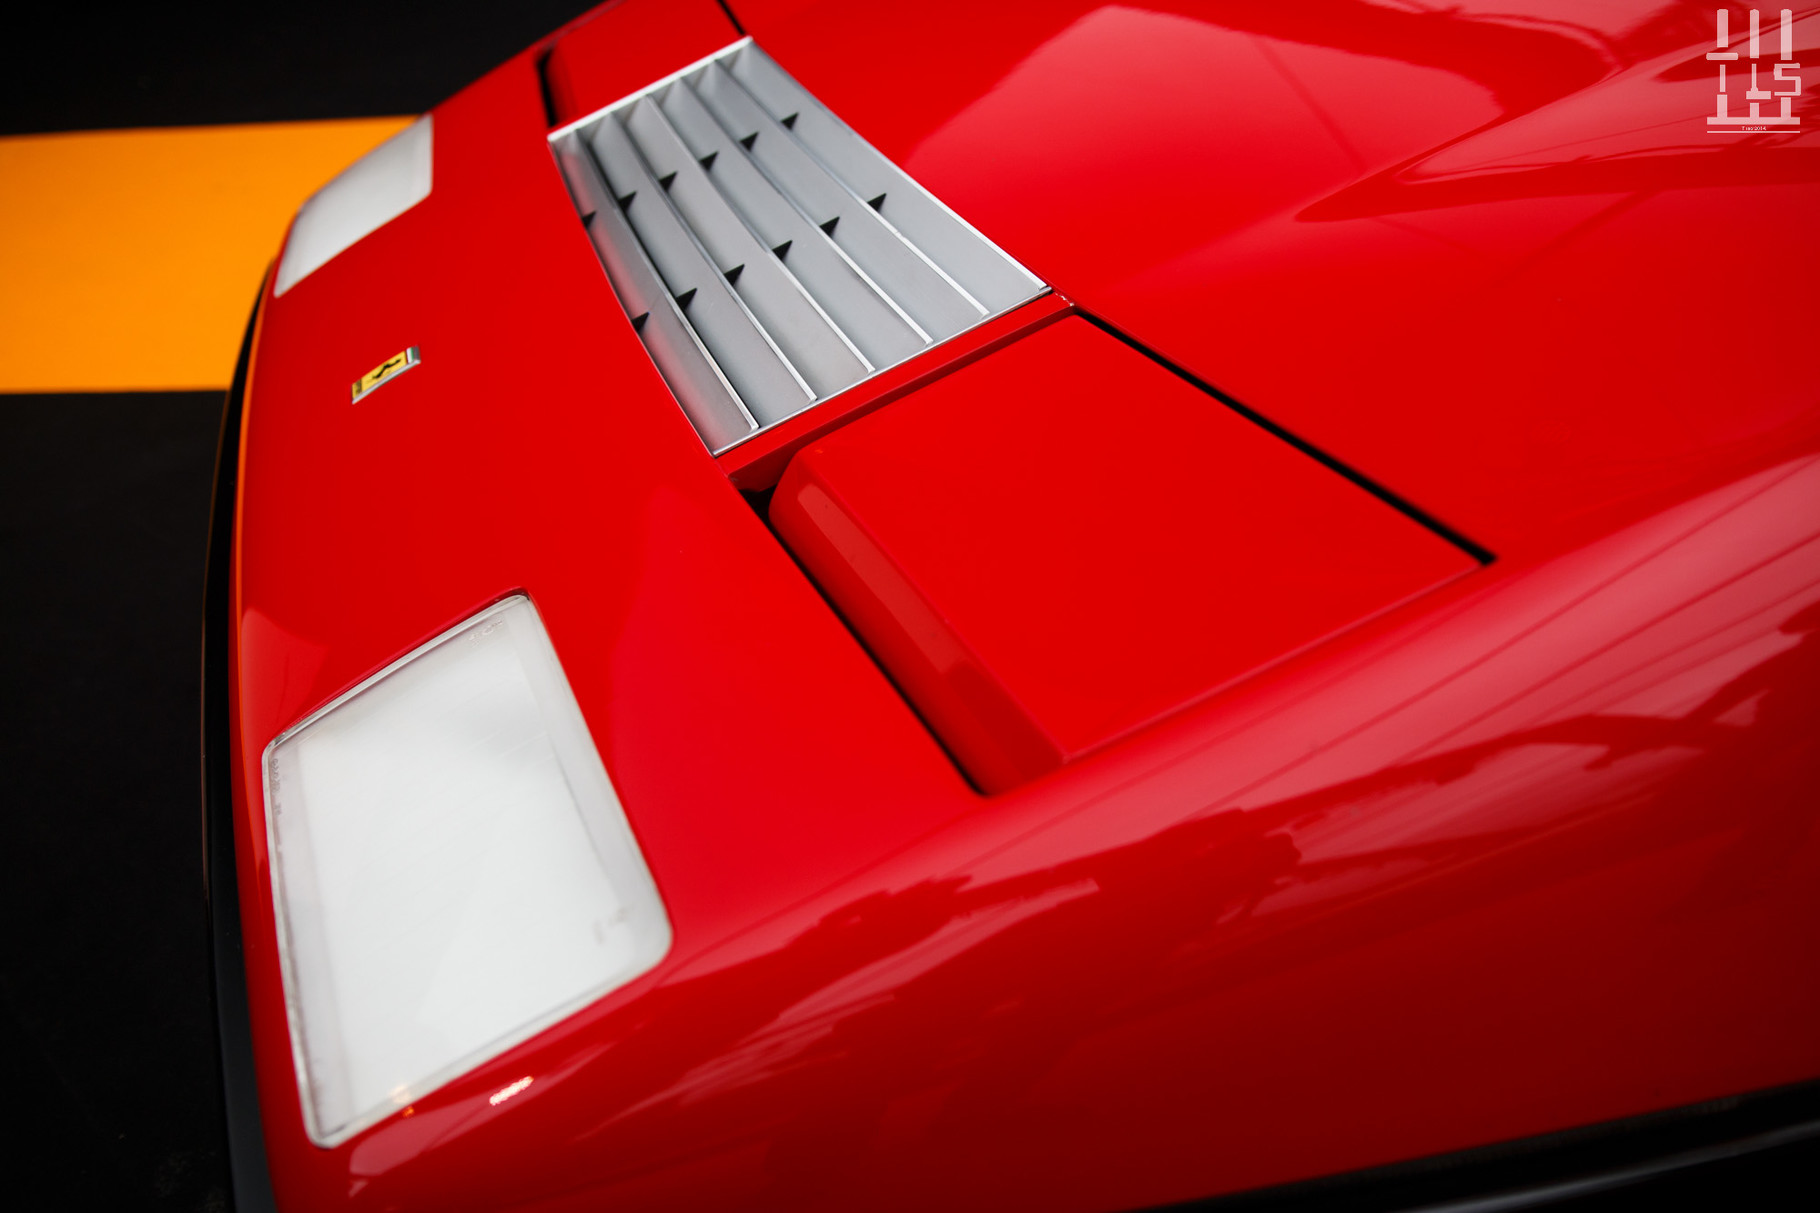 Ferrari 365 GT4 BB, vendue à 400 000 euros.